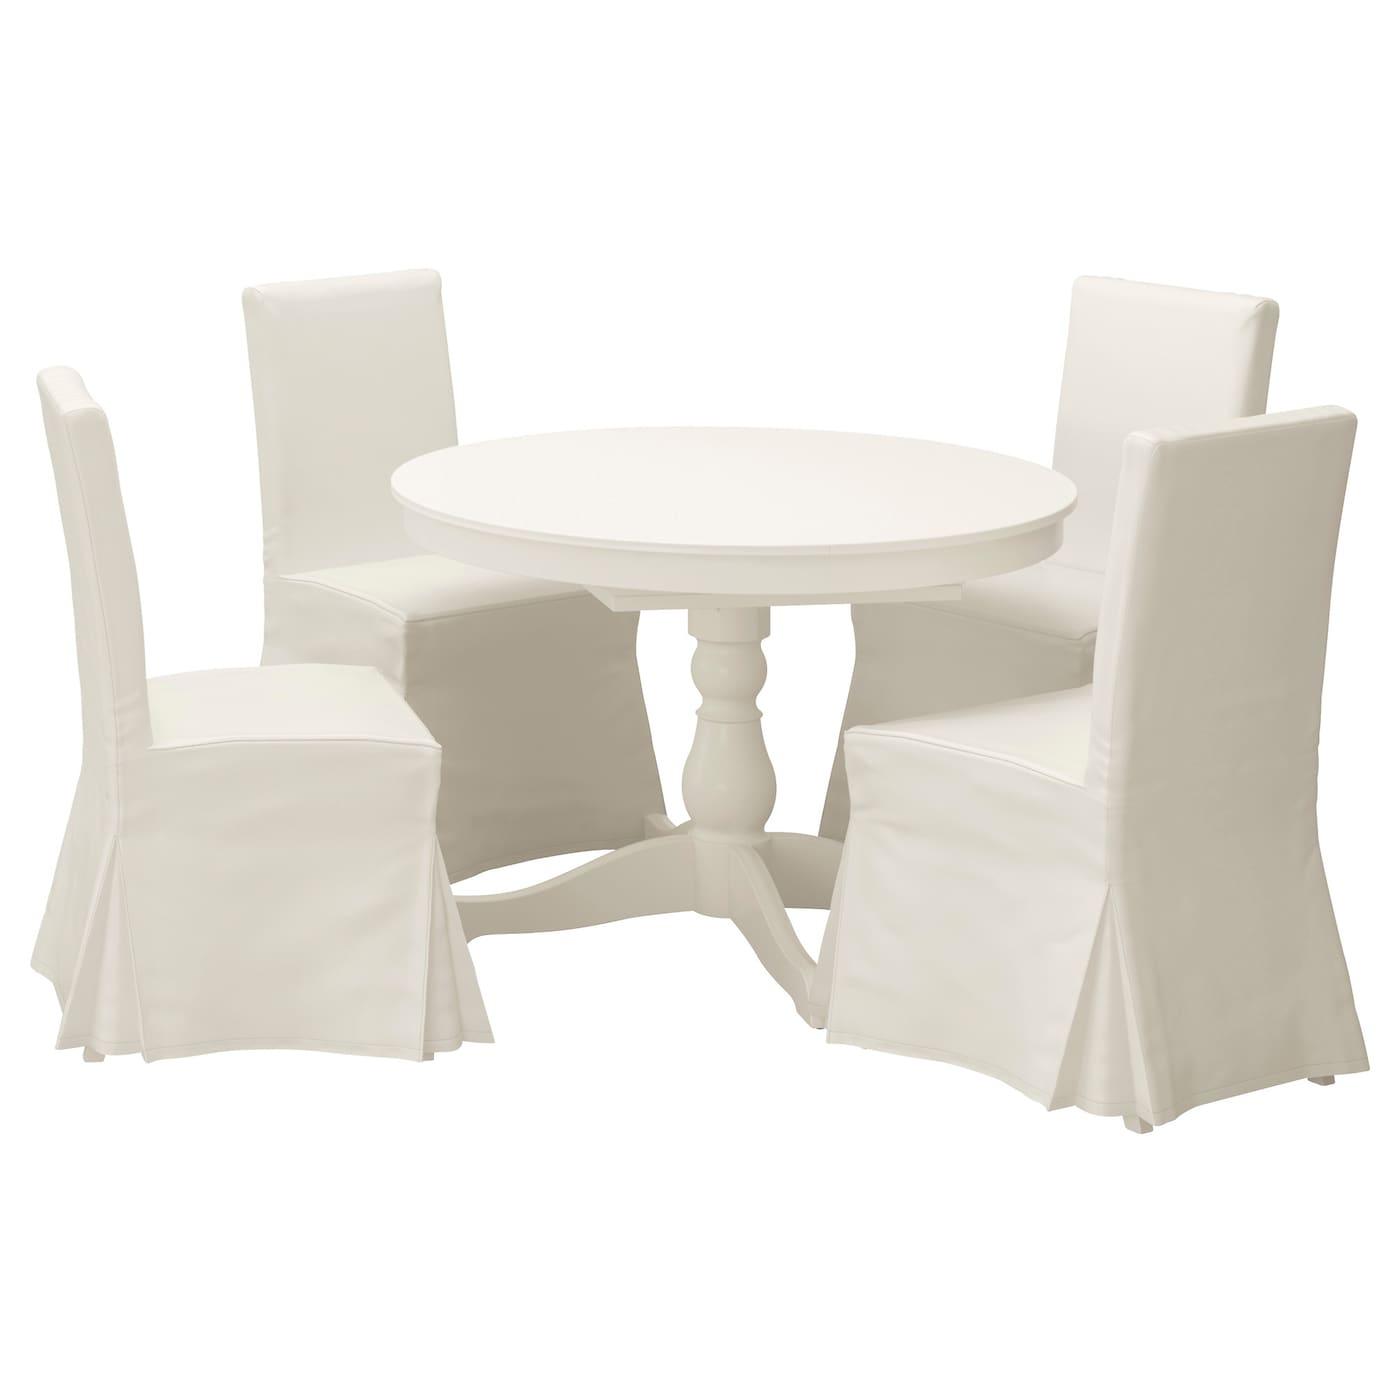 ingatorp henriksdal table et 4 chaises blanc blekinge blanc 110 cm ikea. Black Bedroom Furniture Sets. Home Design Ideas